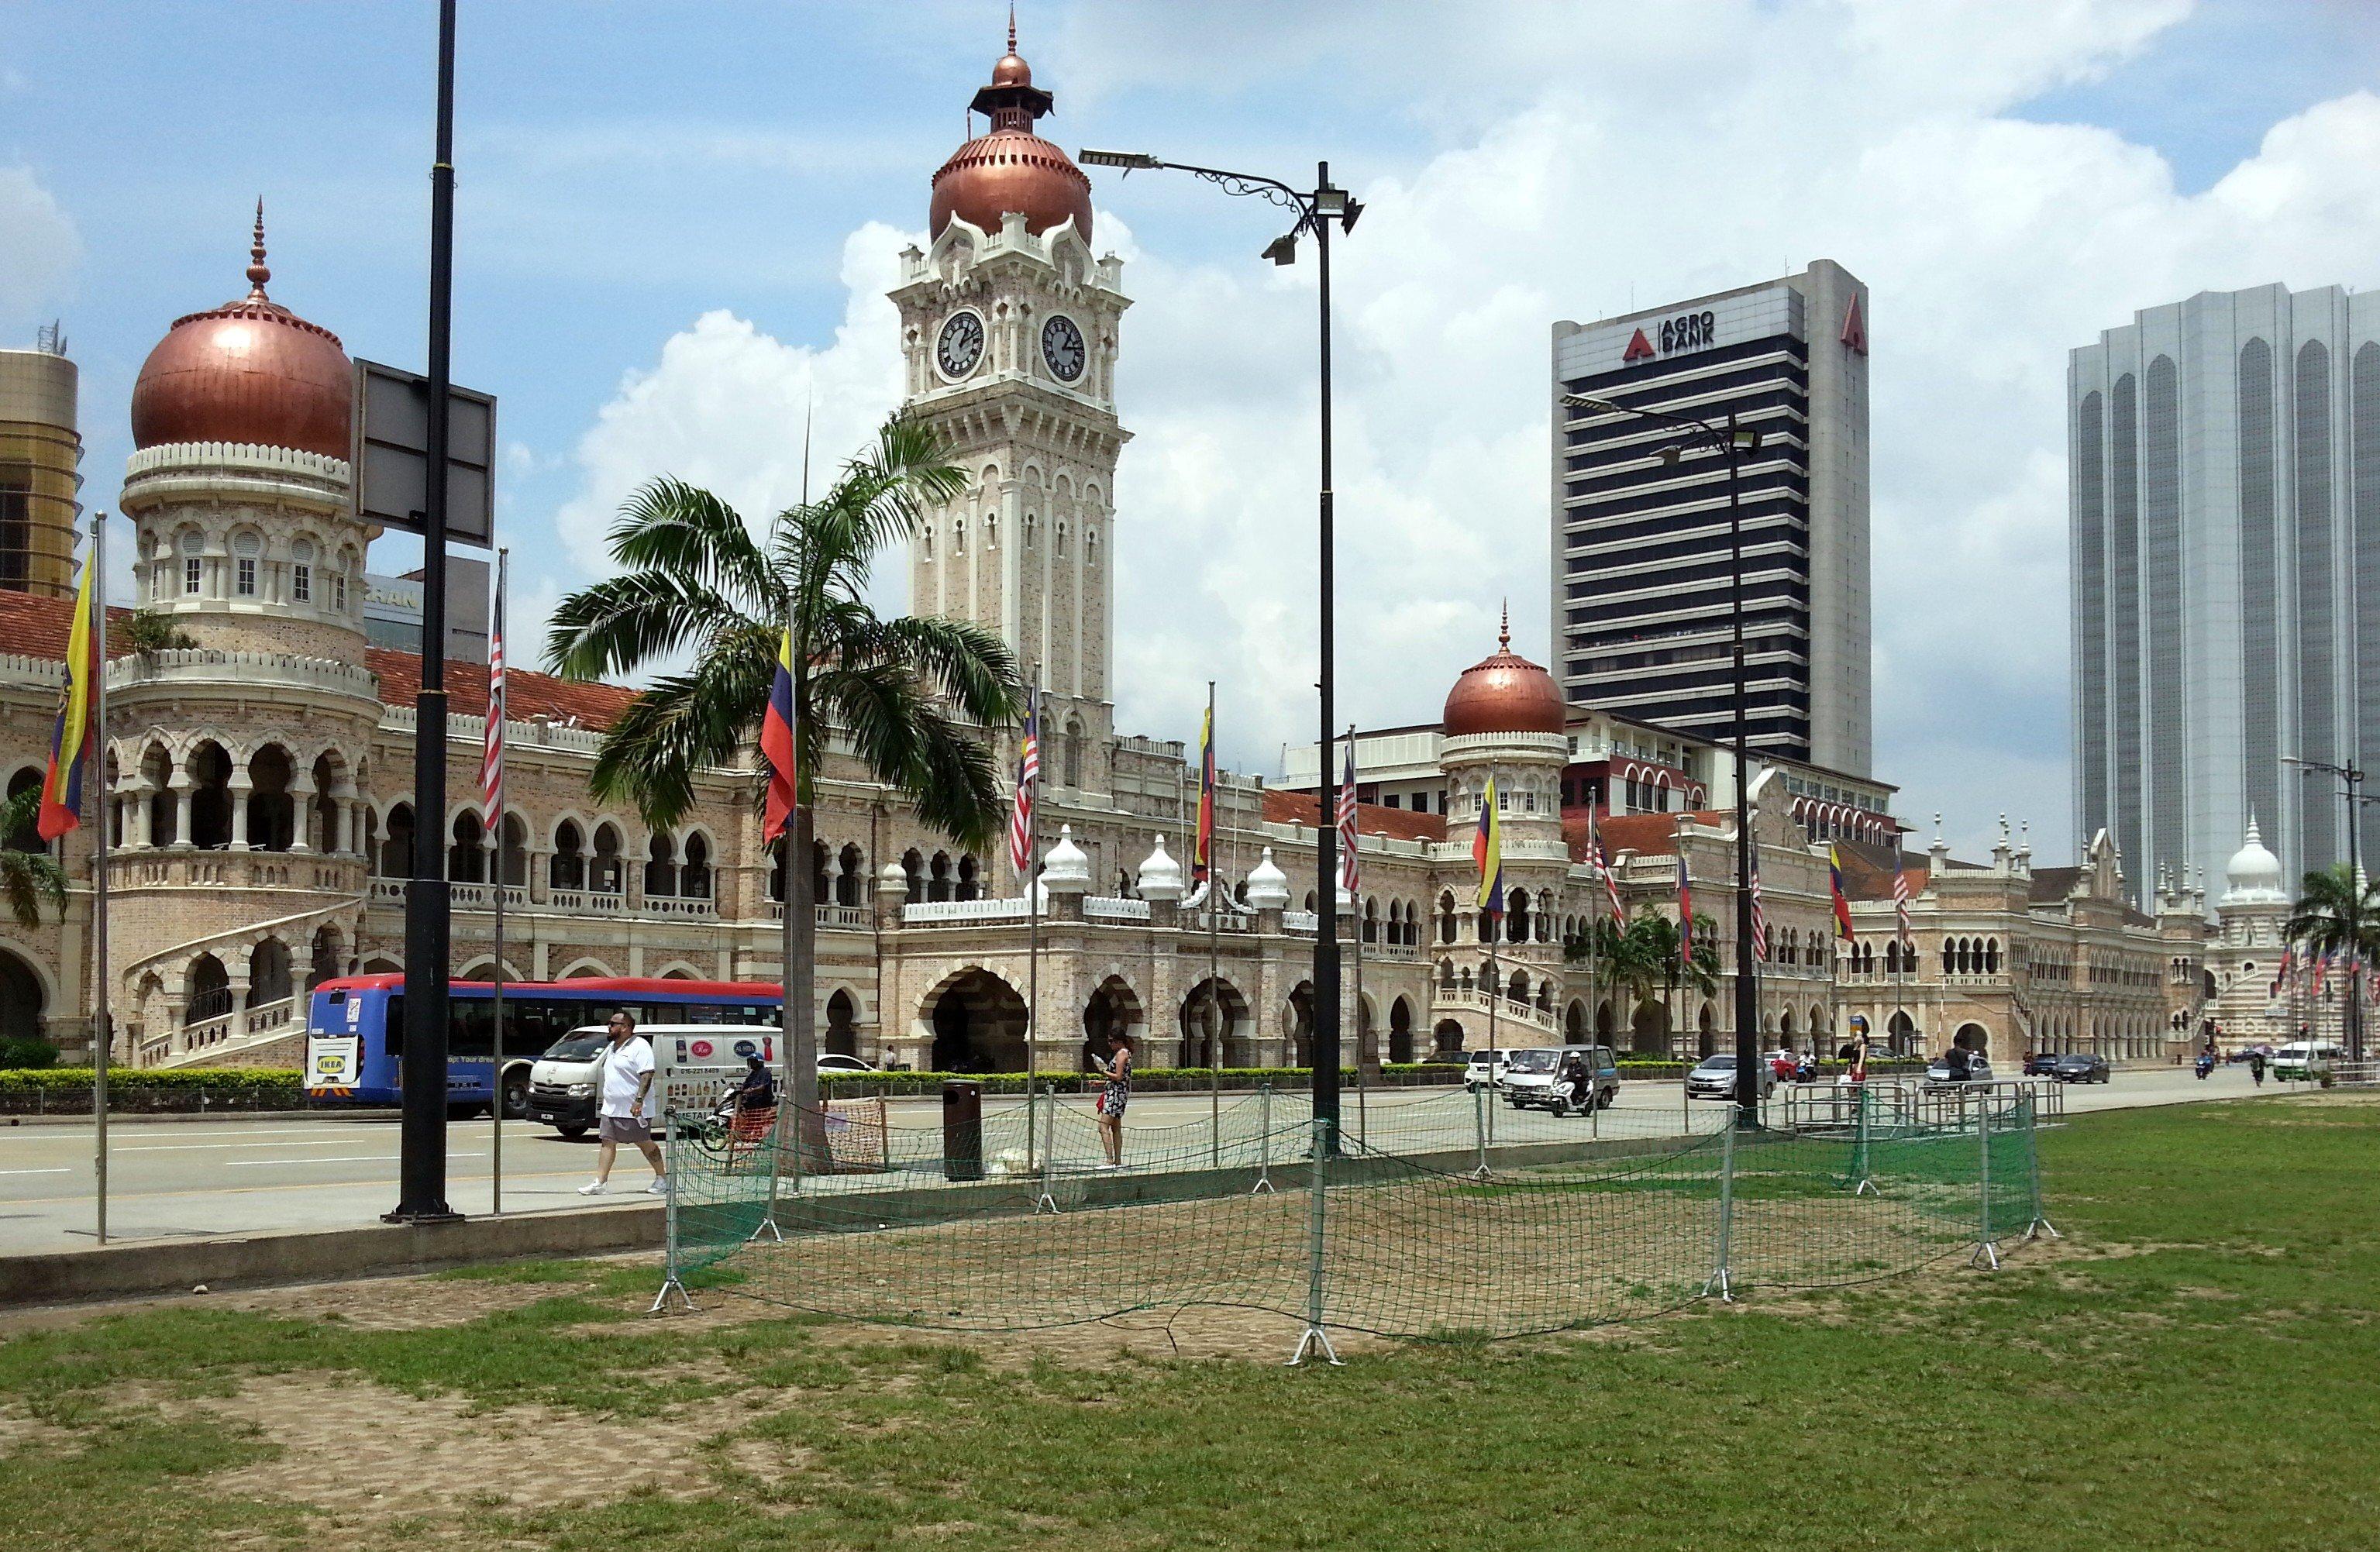 Sultan Abdul Samad Building on Merdeka Square in Kuala Lumpur